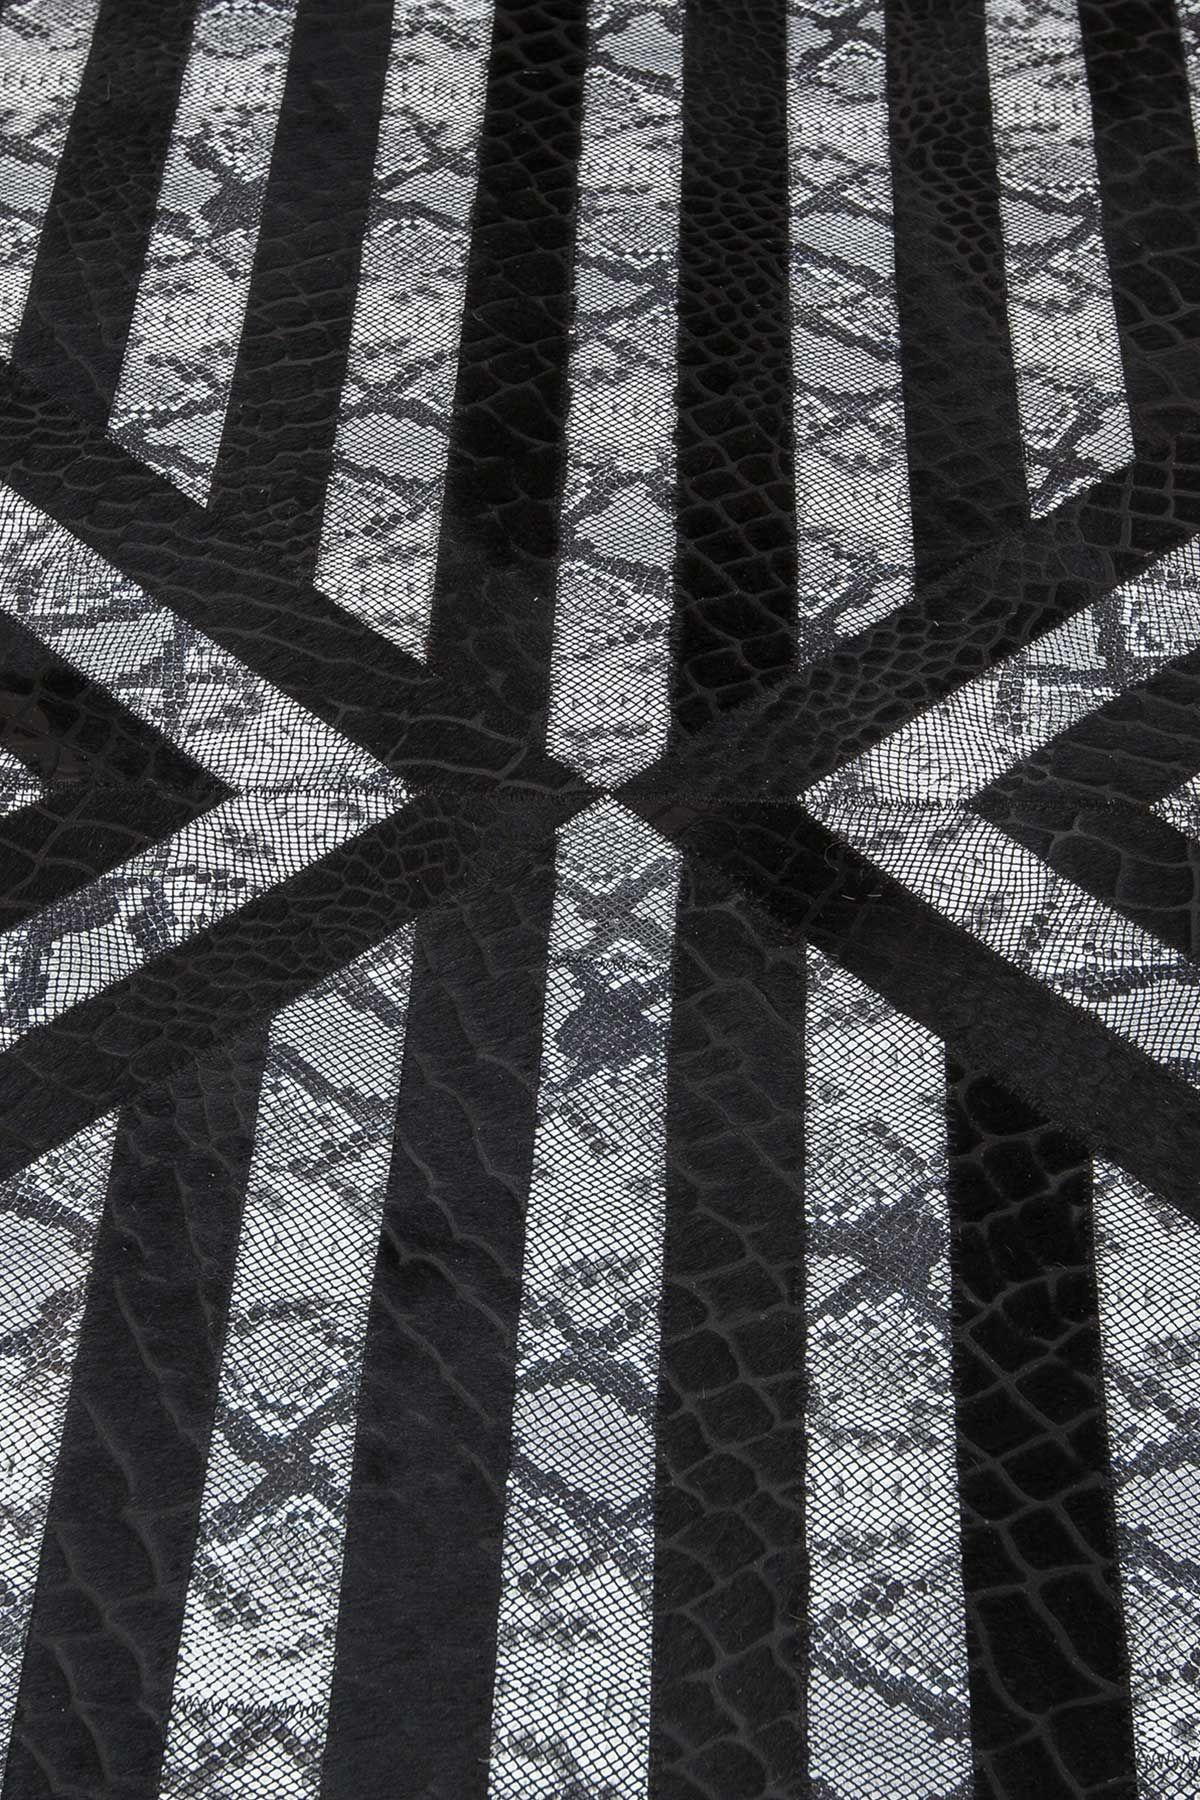 Erdogan Deri Leather Rug With Crocodile Geometric Pattern Black